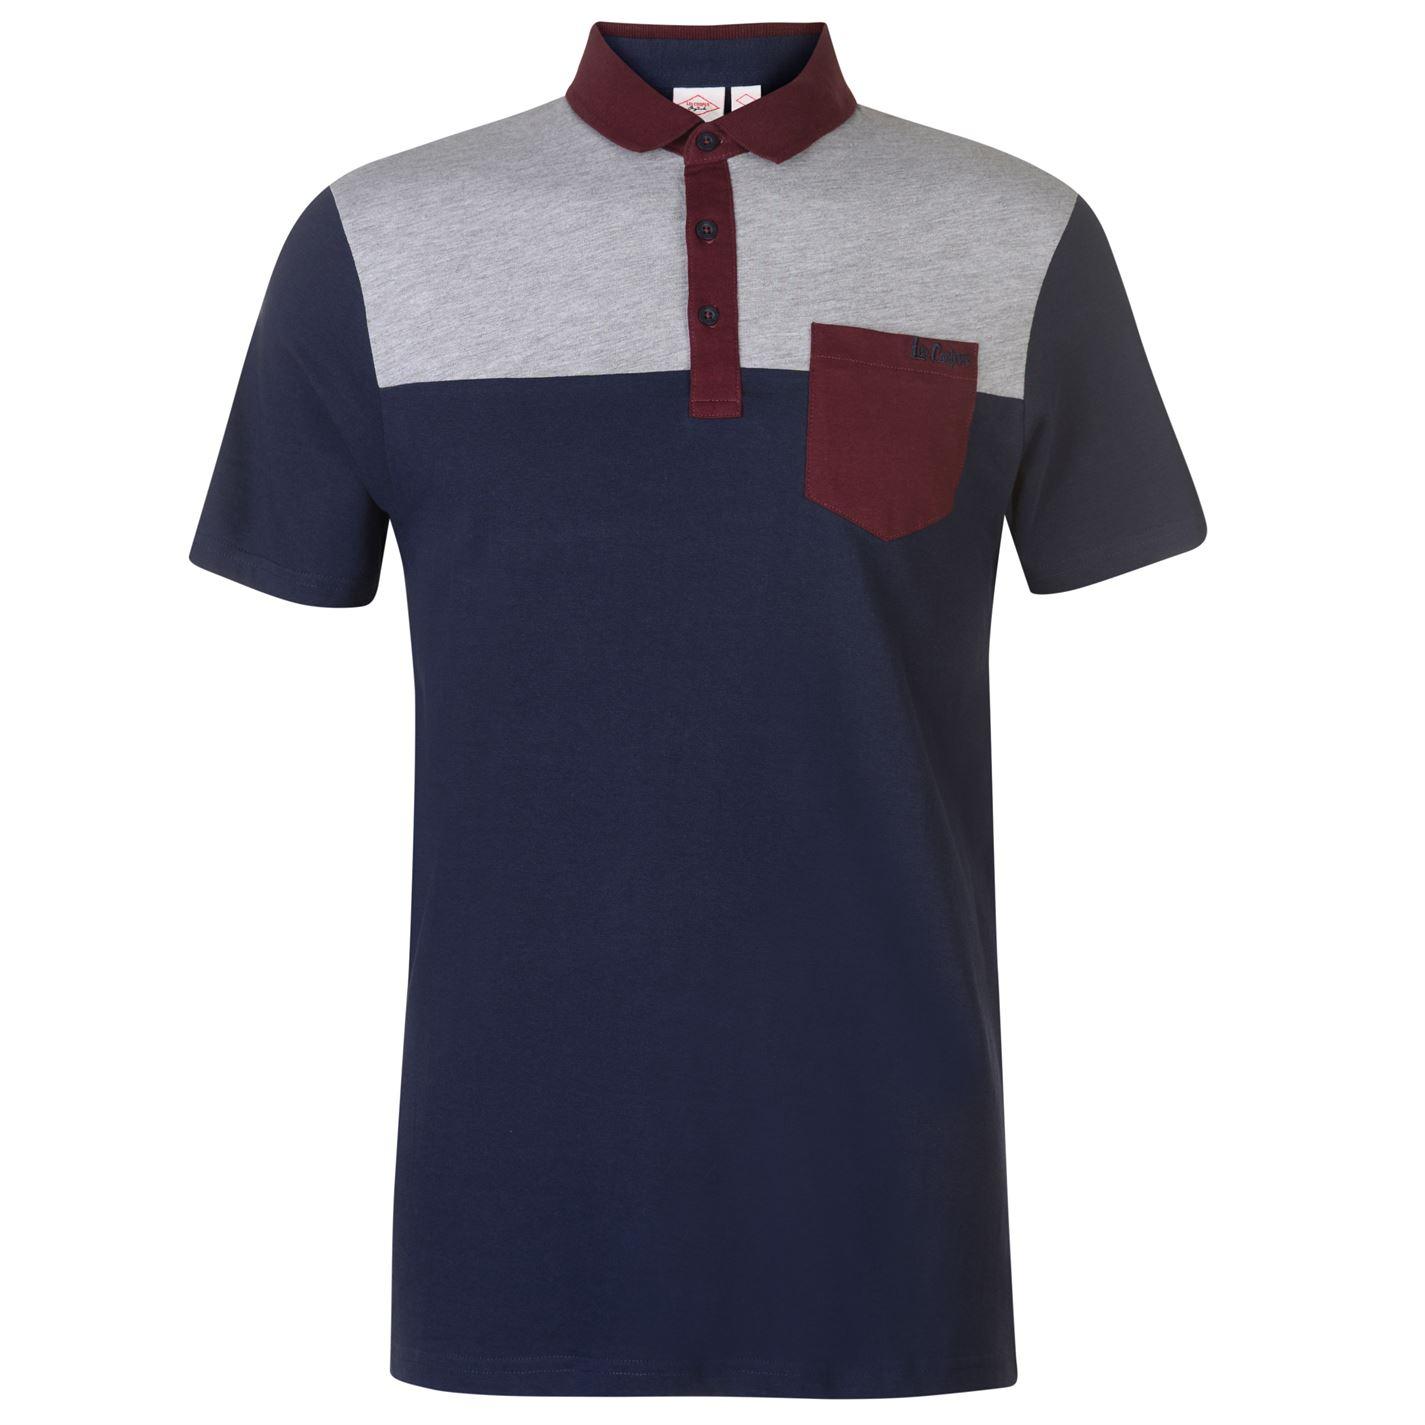 Lee Cooper Polo Shirt Mens